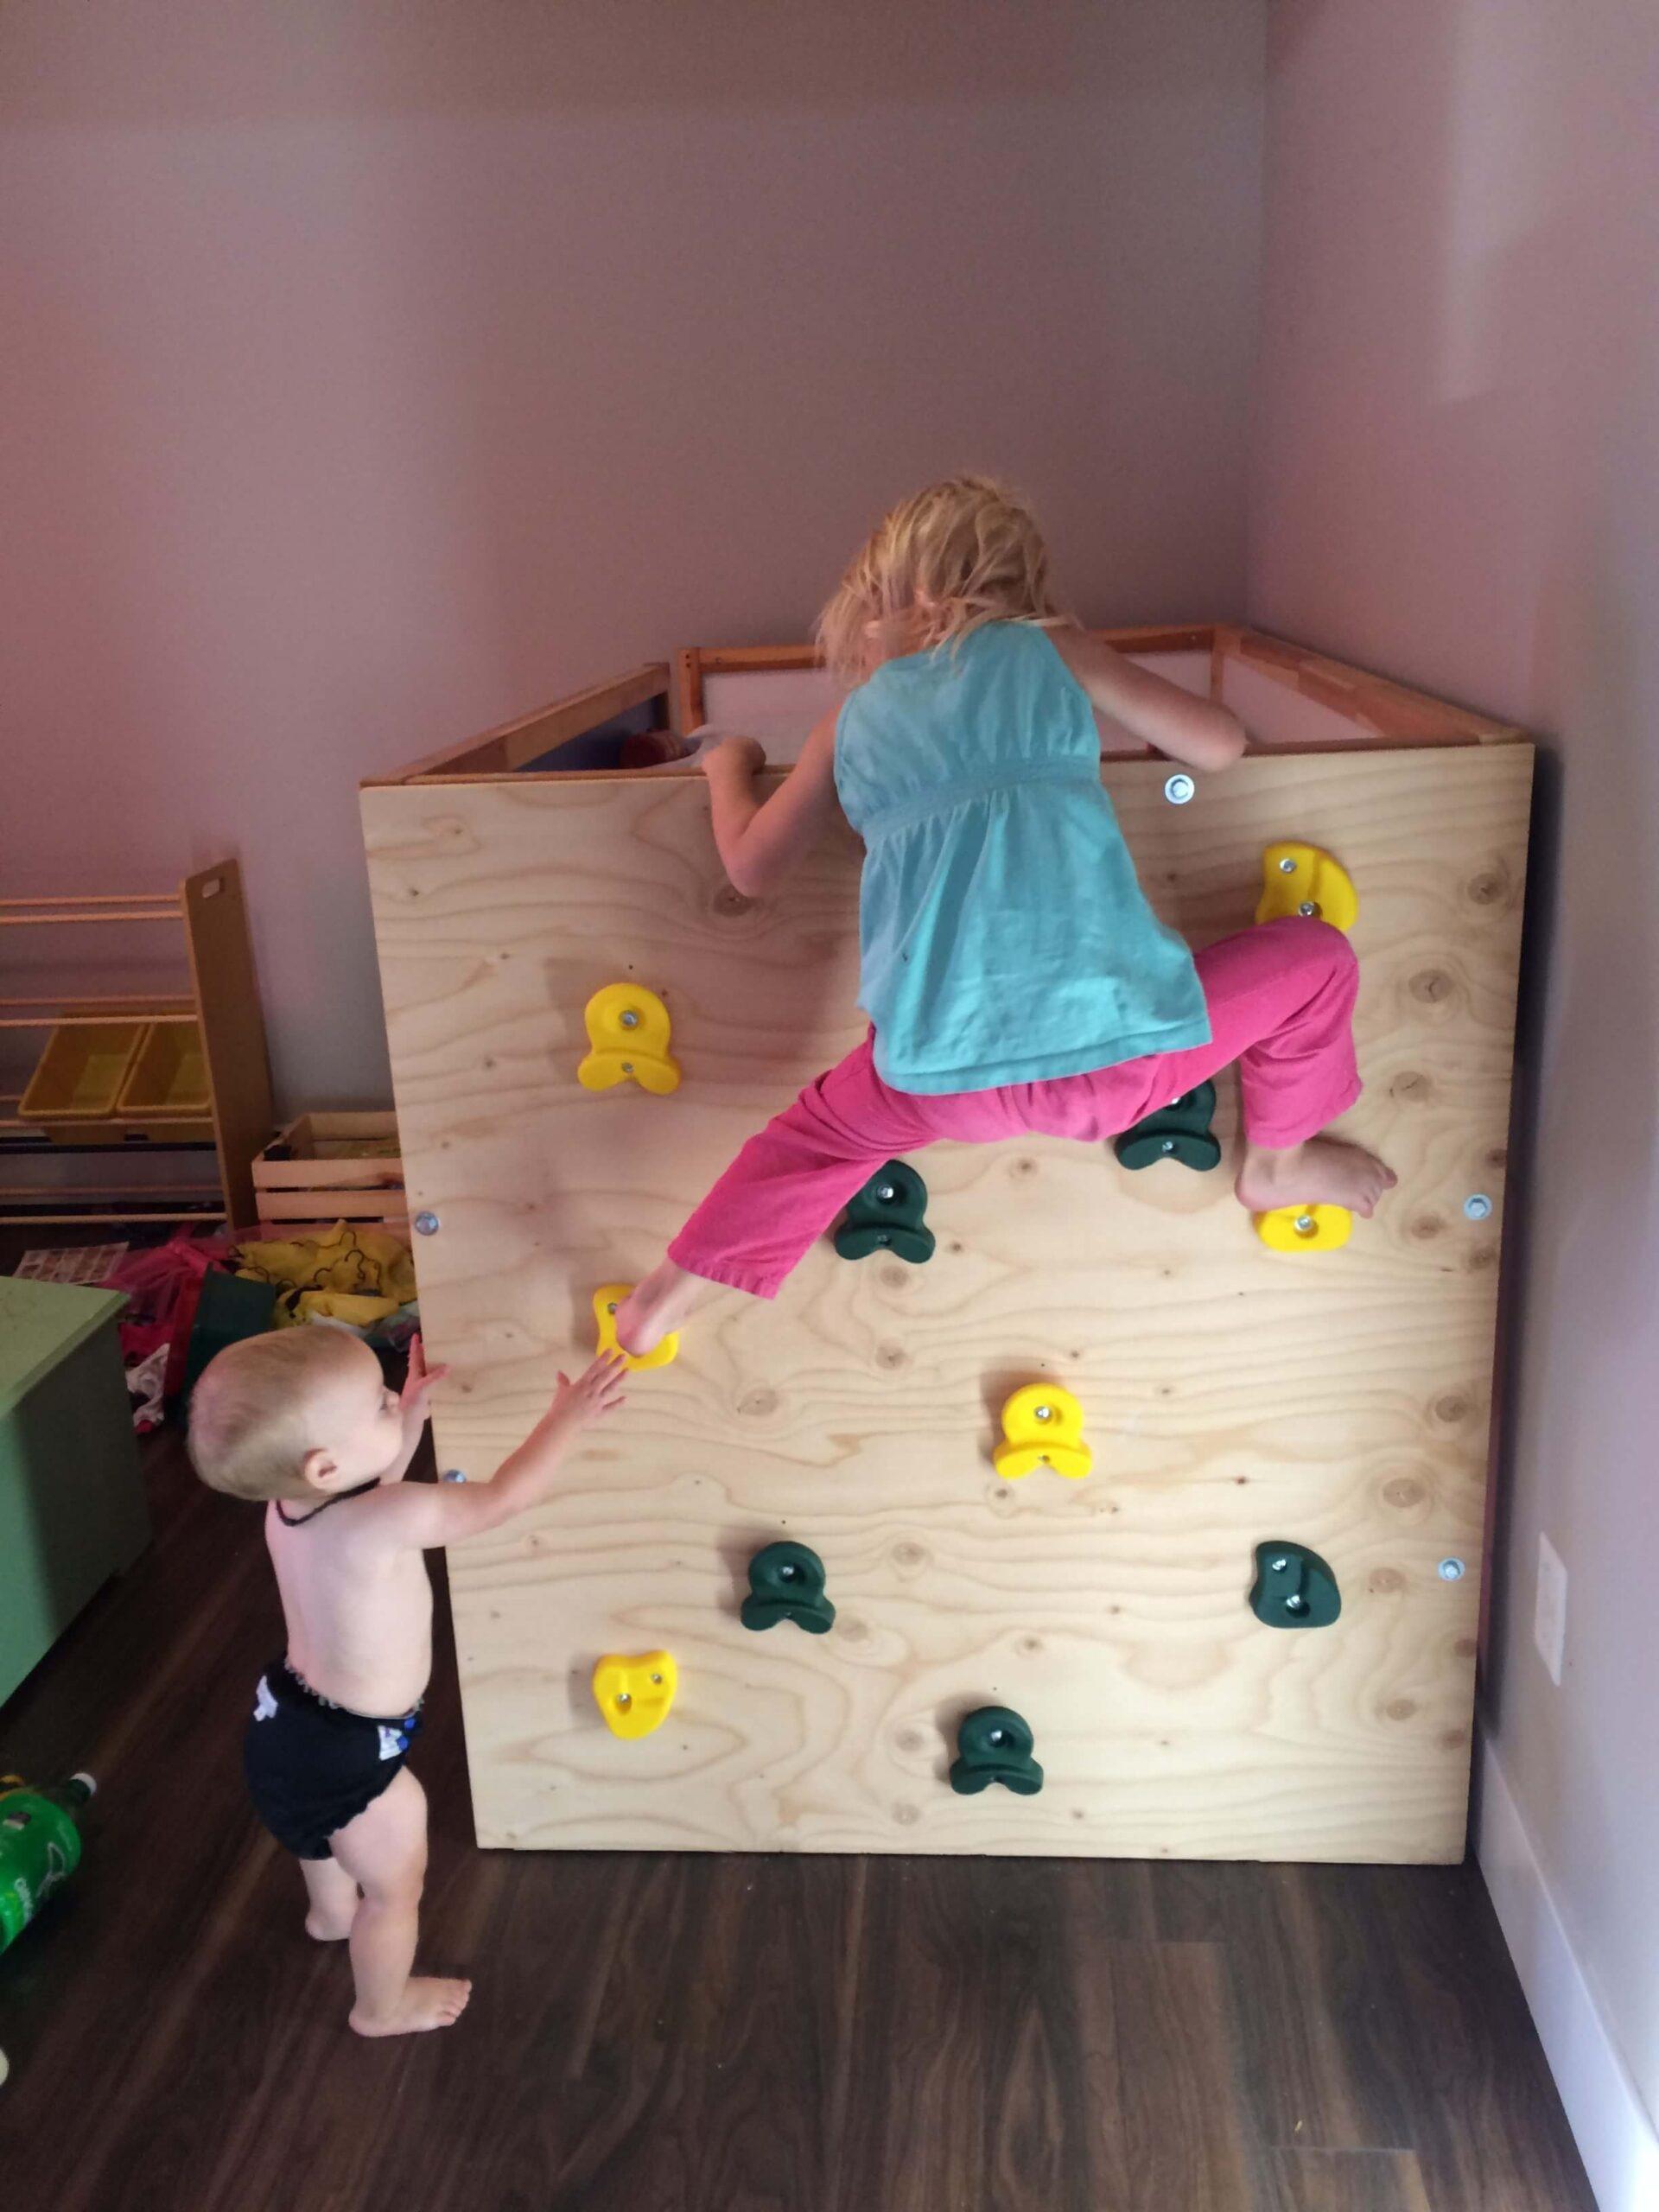 Full Size of Kura Hack Ikea Bed Climbing Wall As Time Flies Wohnzimmer Kura Hack